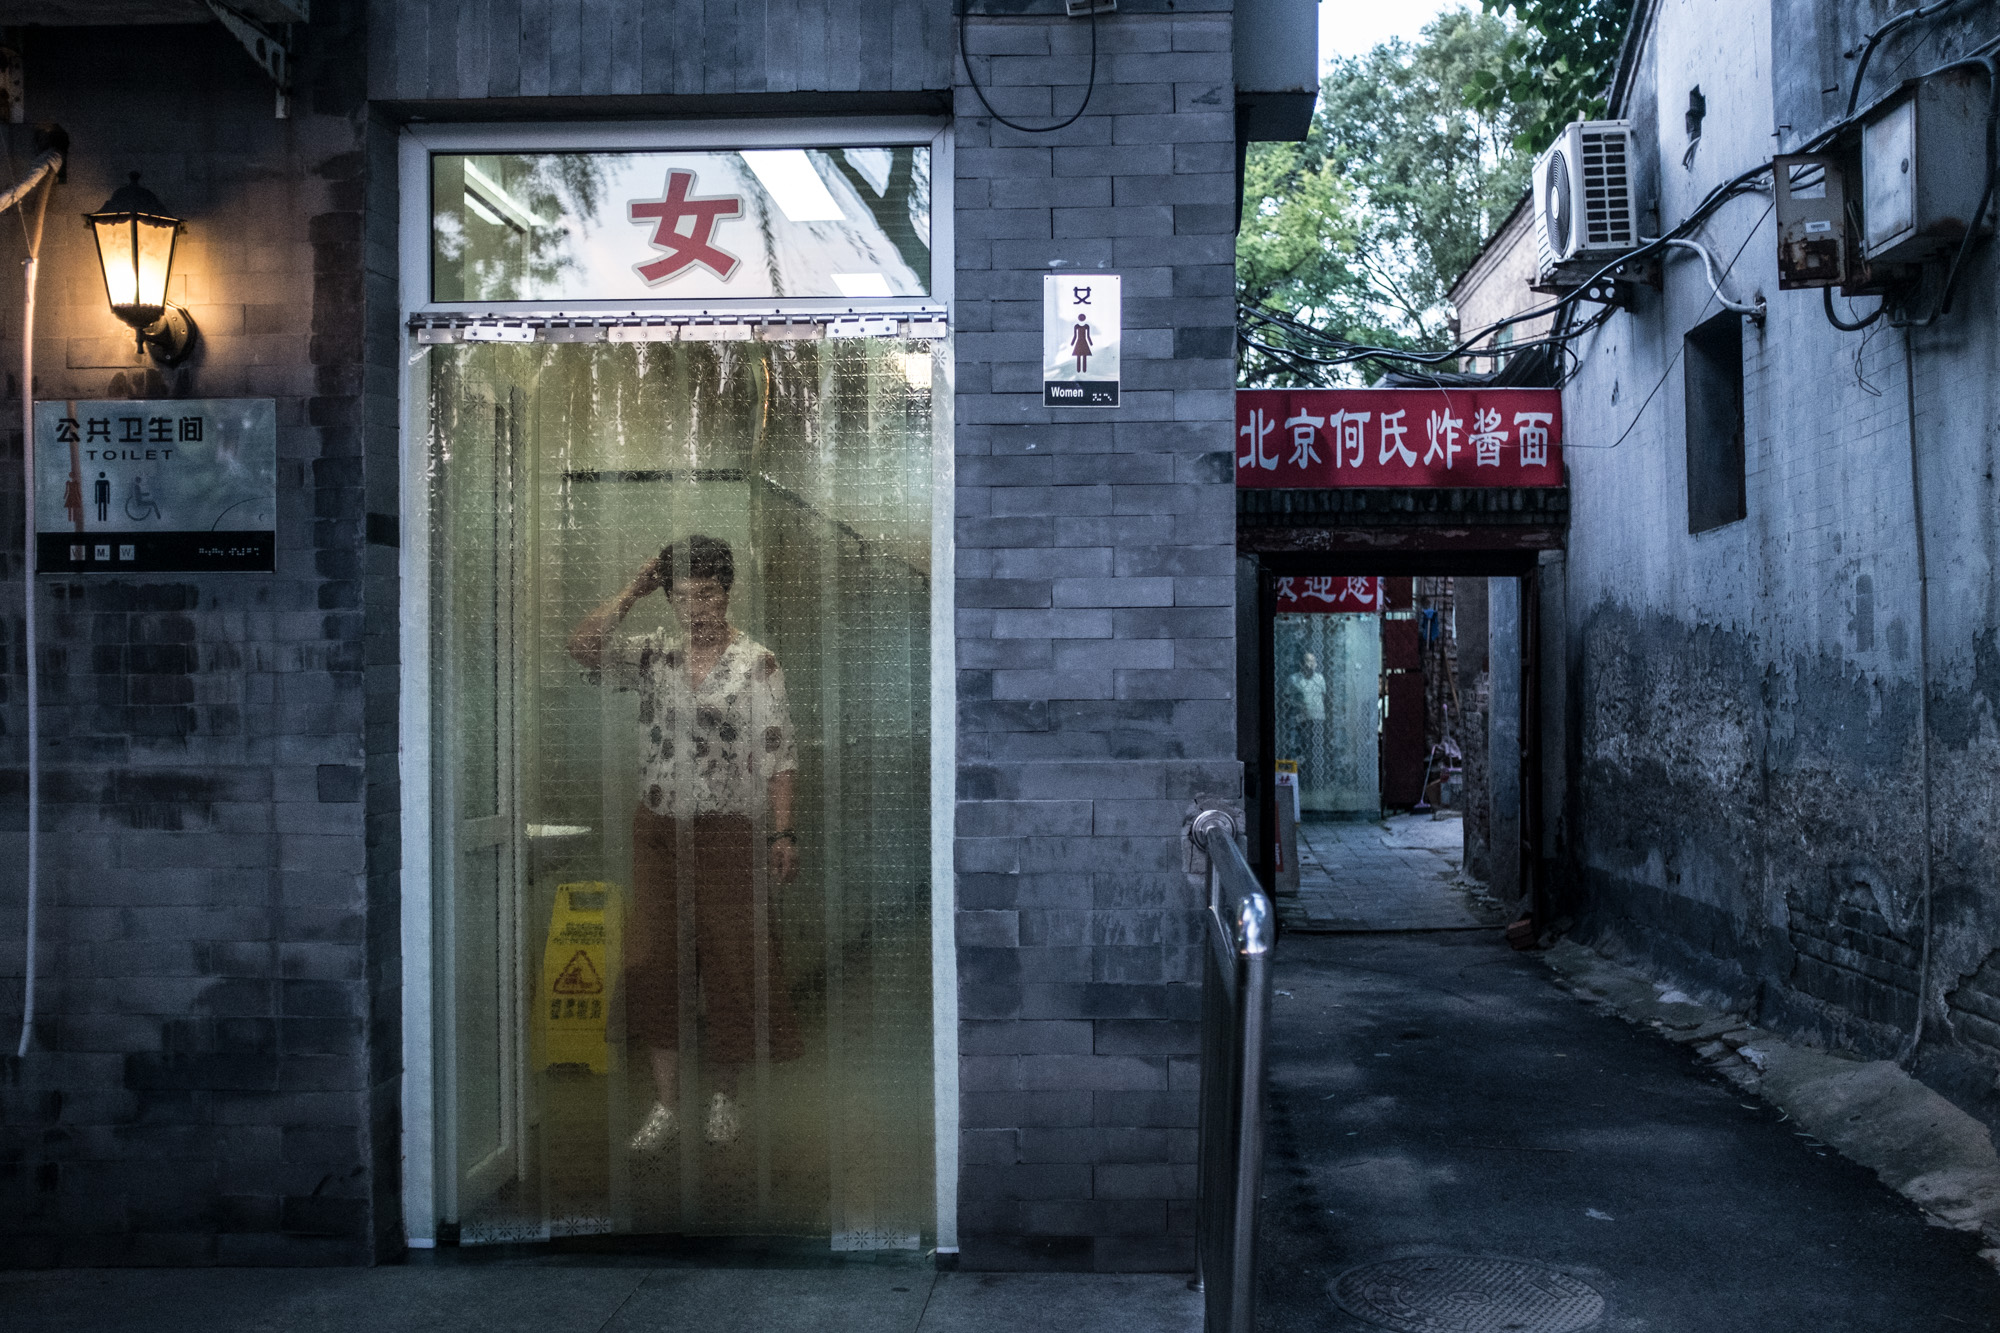 Public toilets in the Shichahai area, Beijing, August 2017